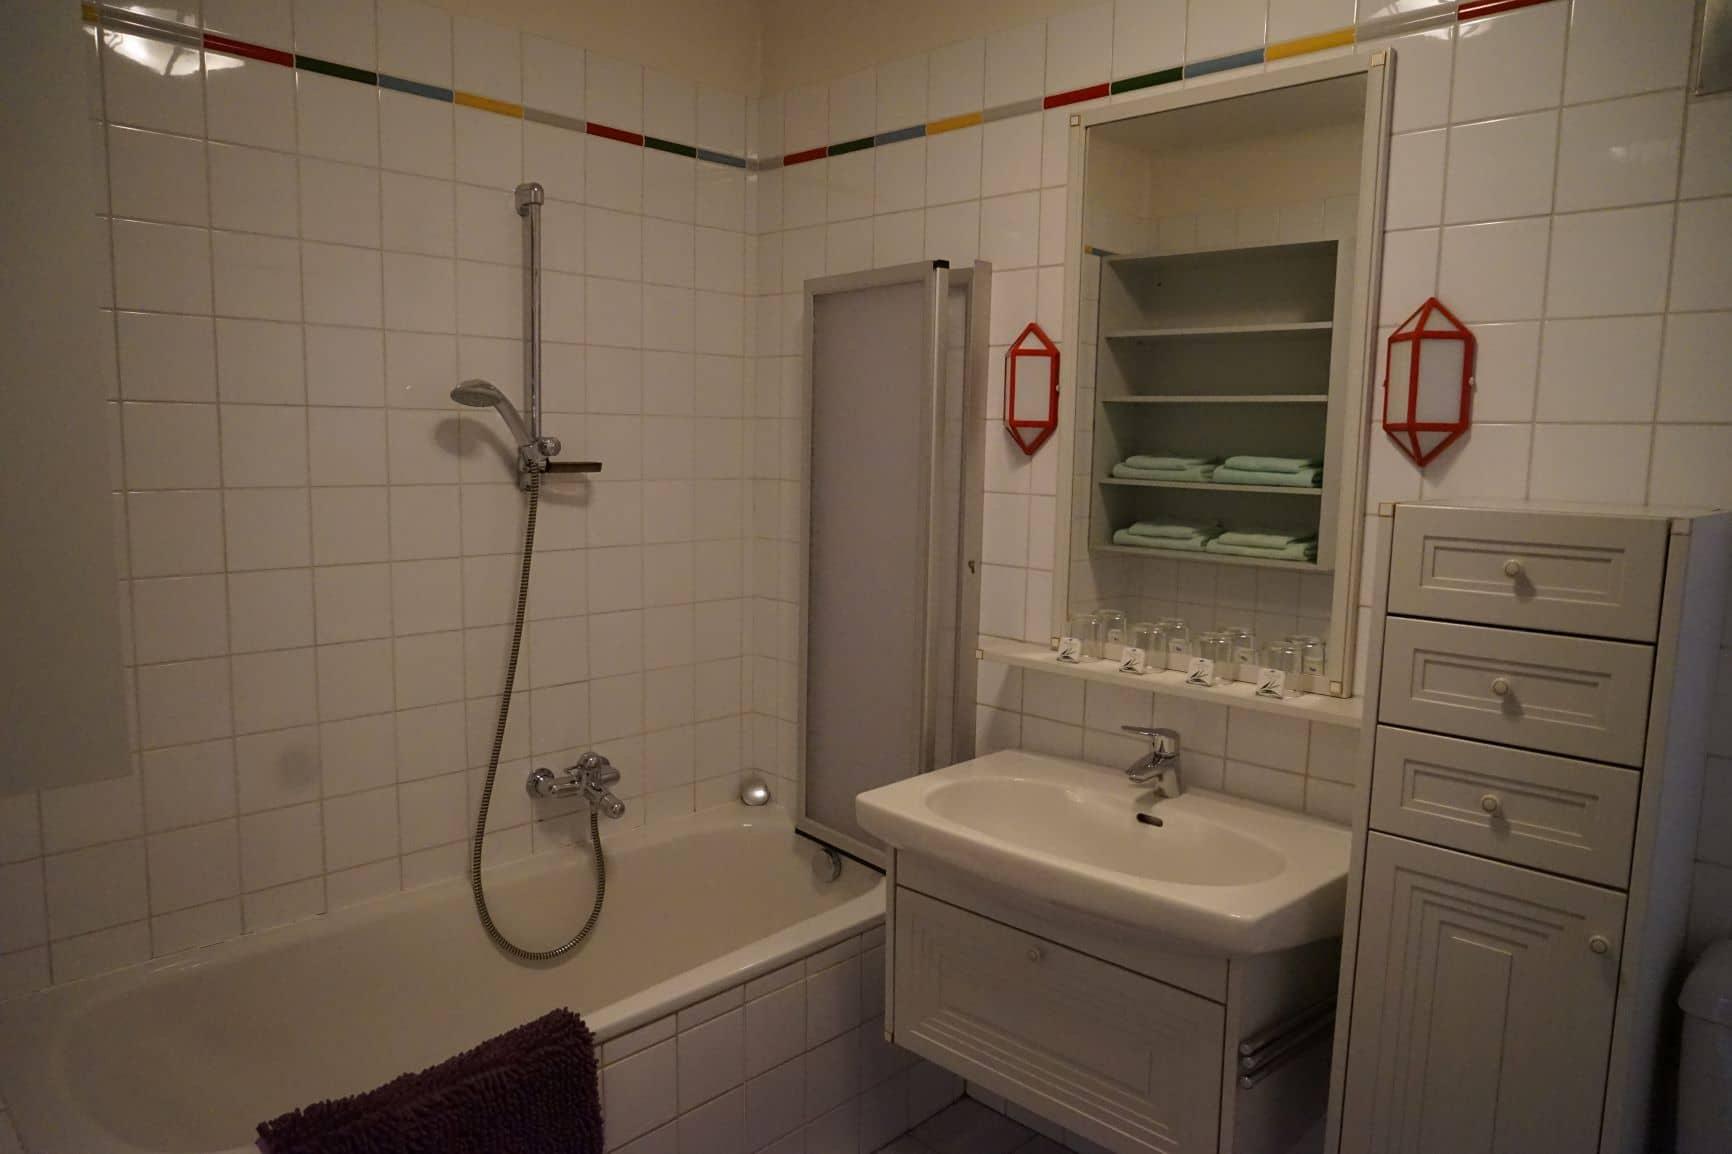 Apartment 11 - Dusche